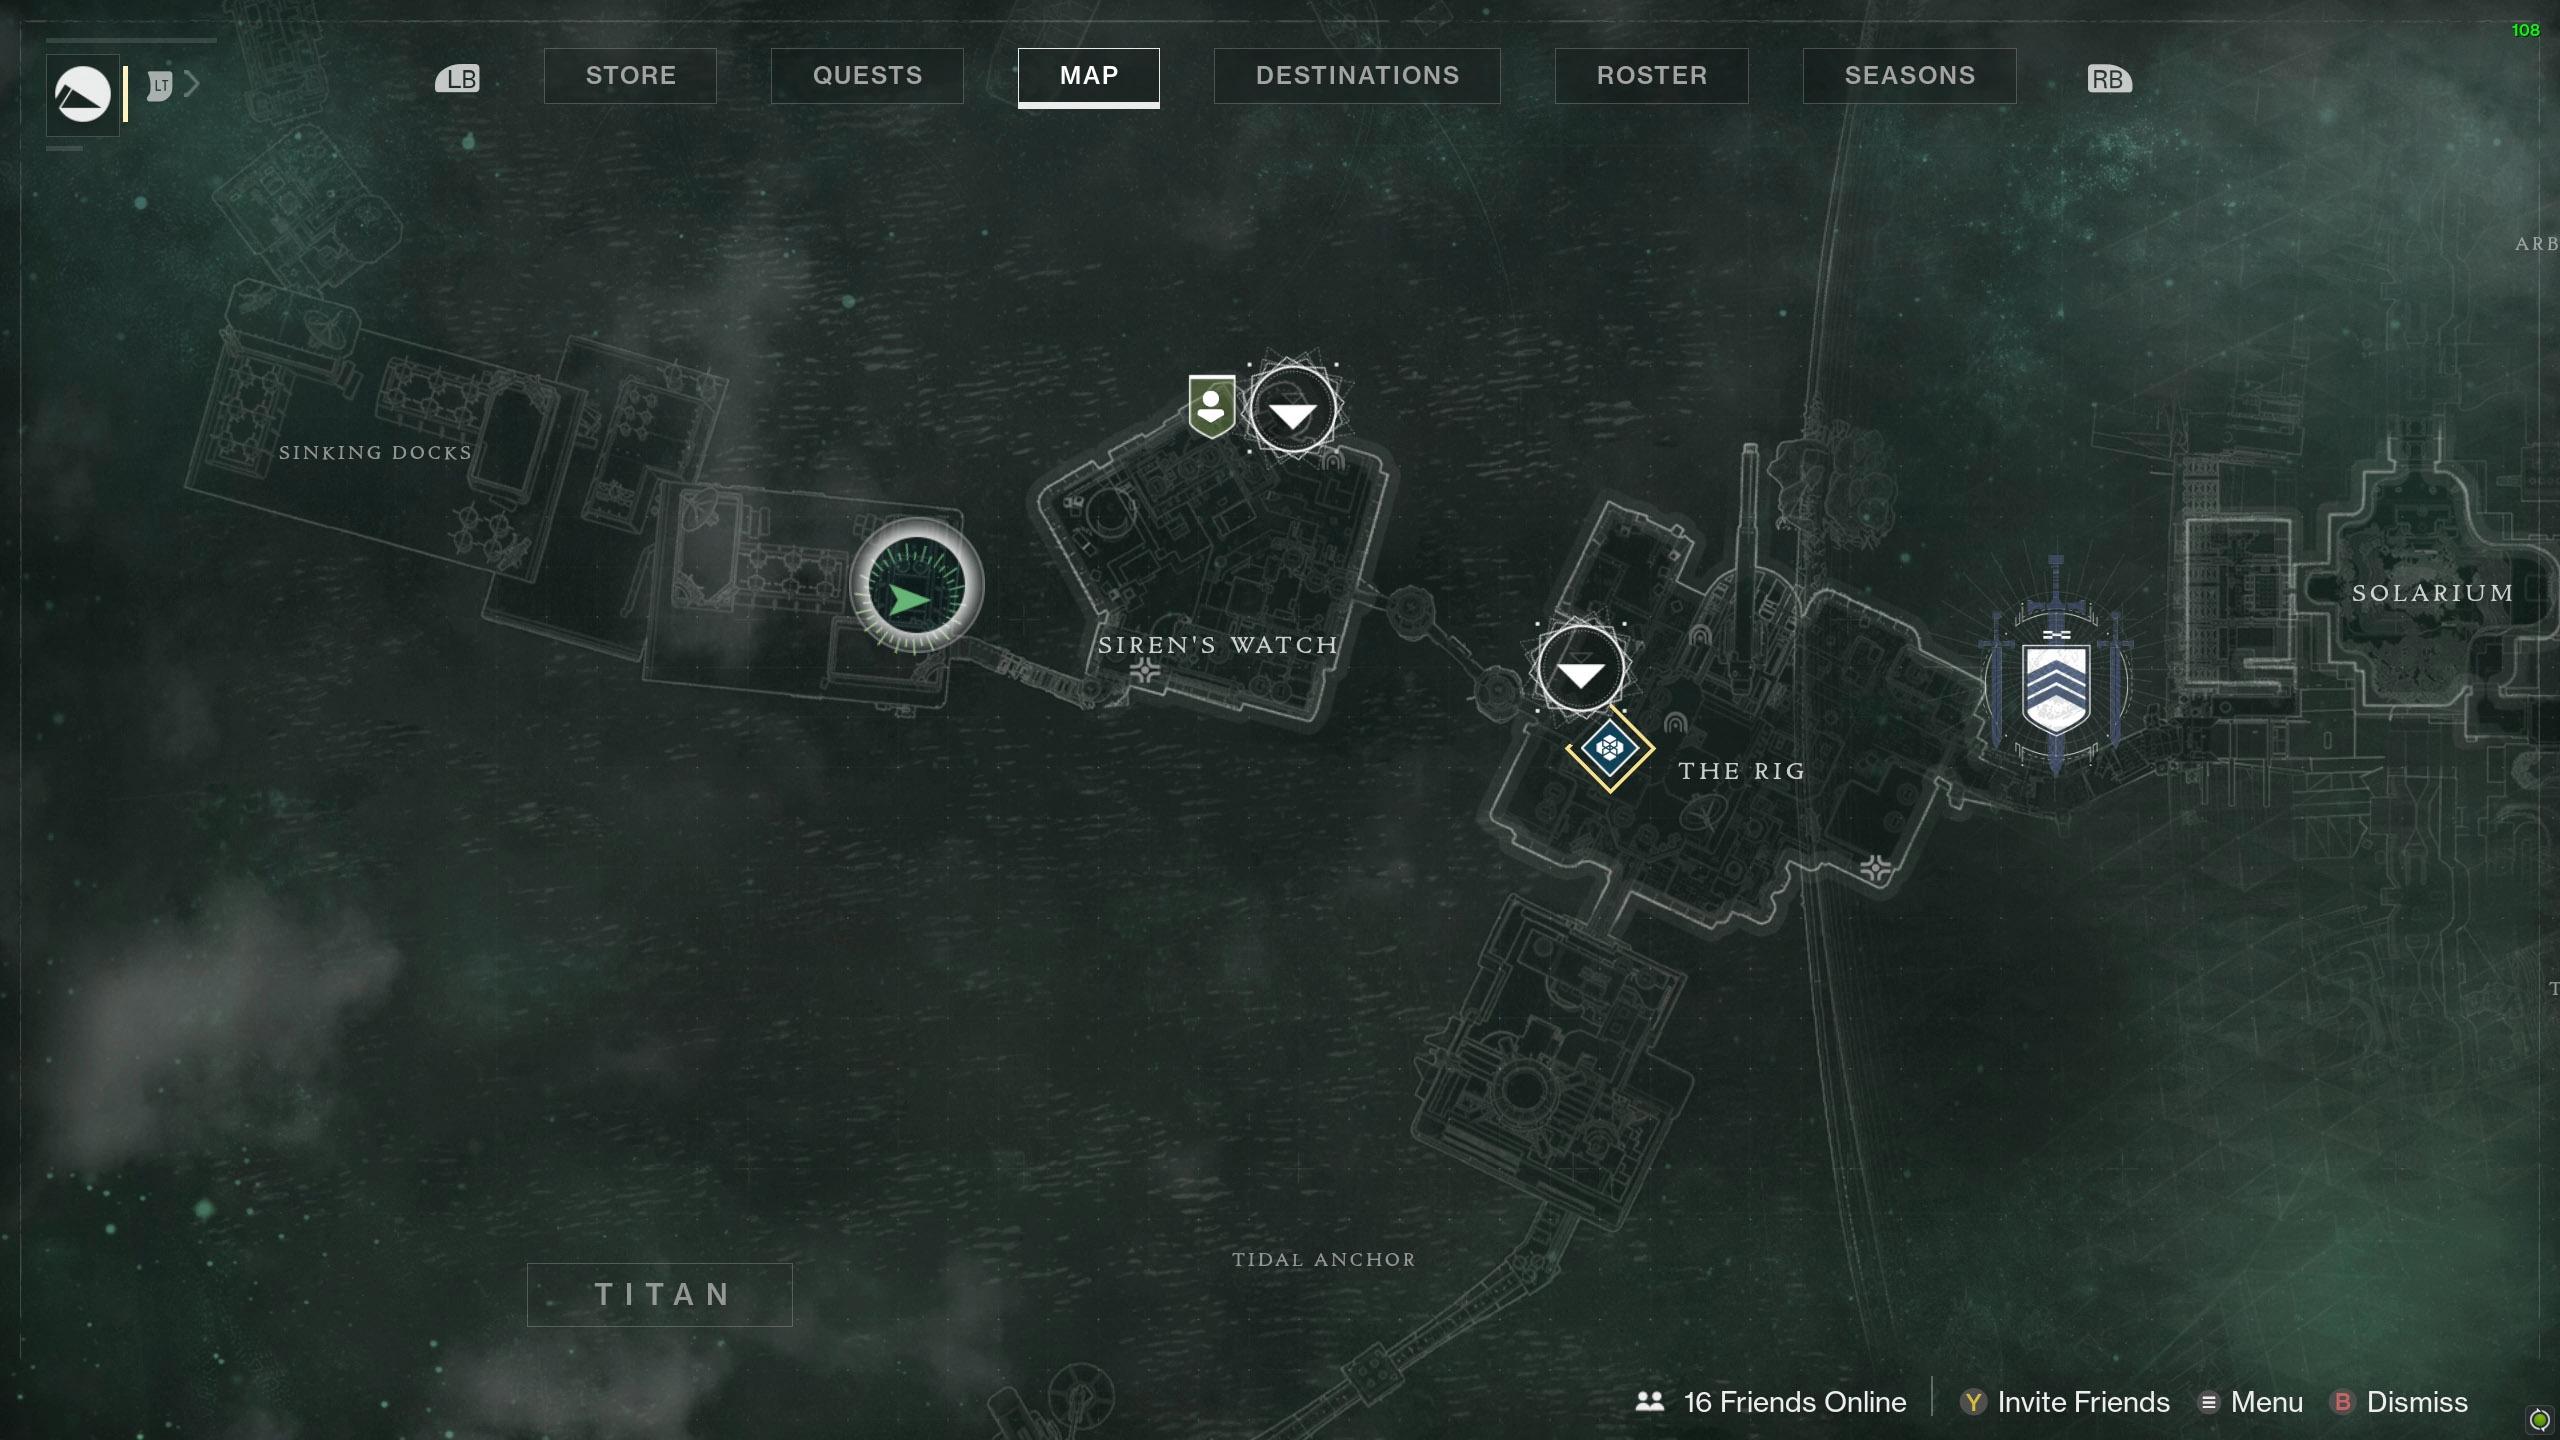 Destiny 2 Savanthuns Eyes Titan Sinking Docks map